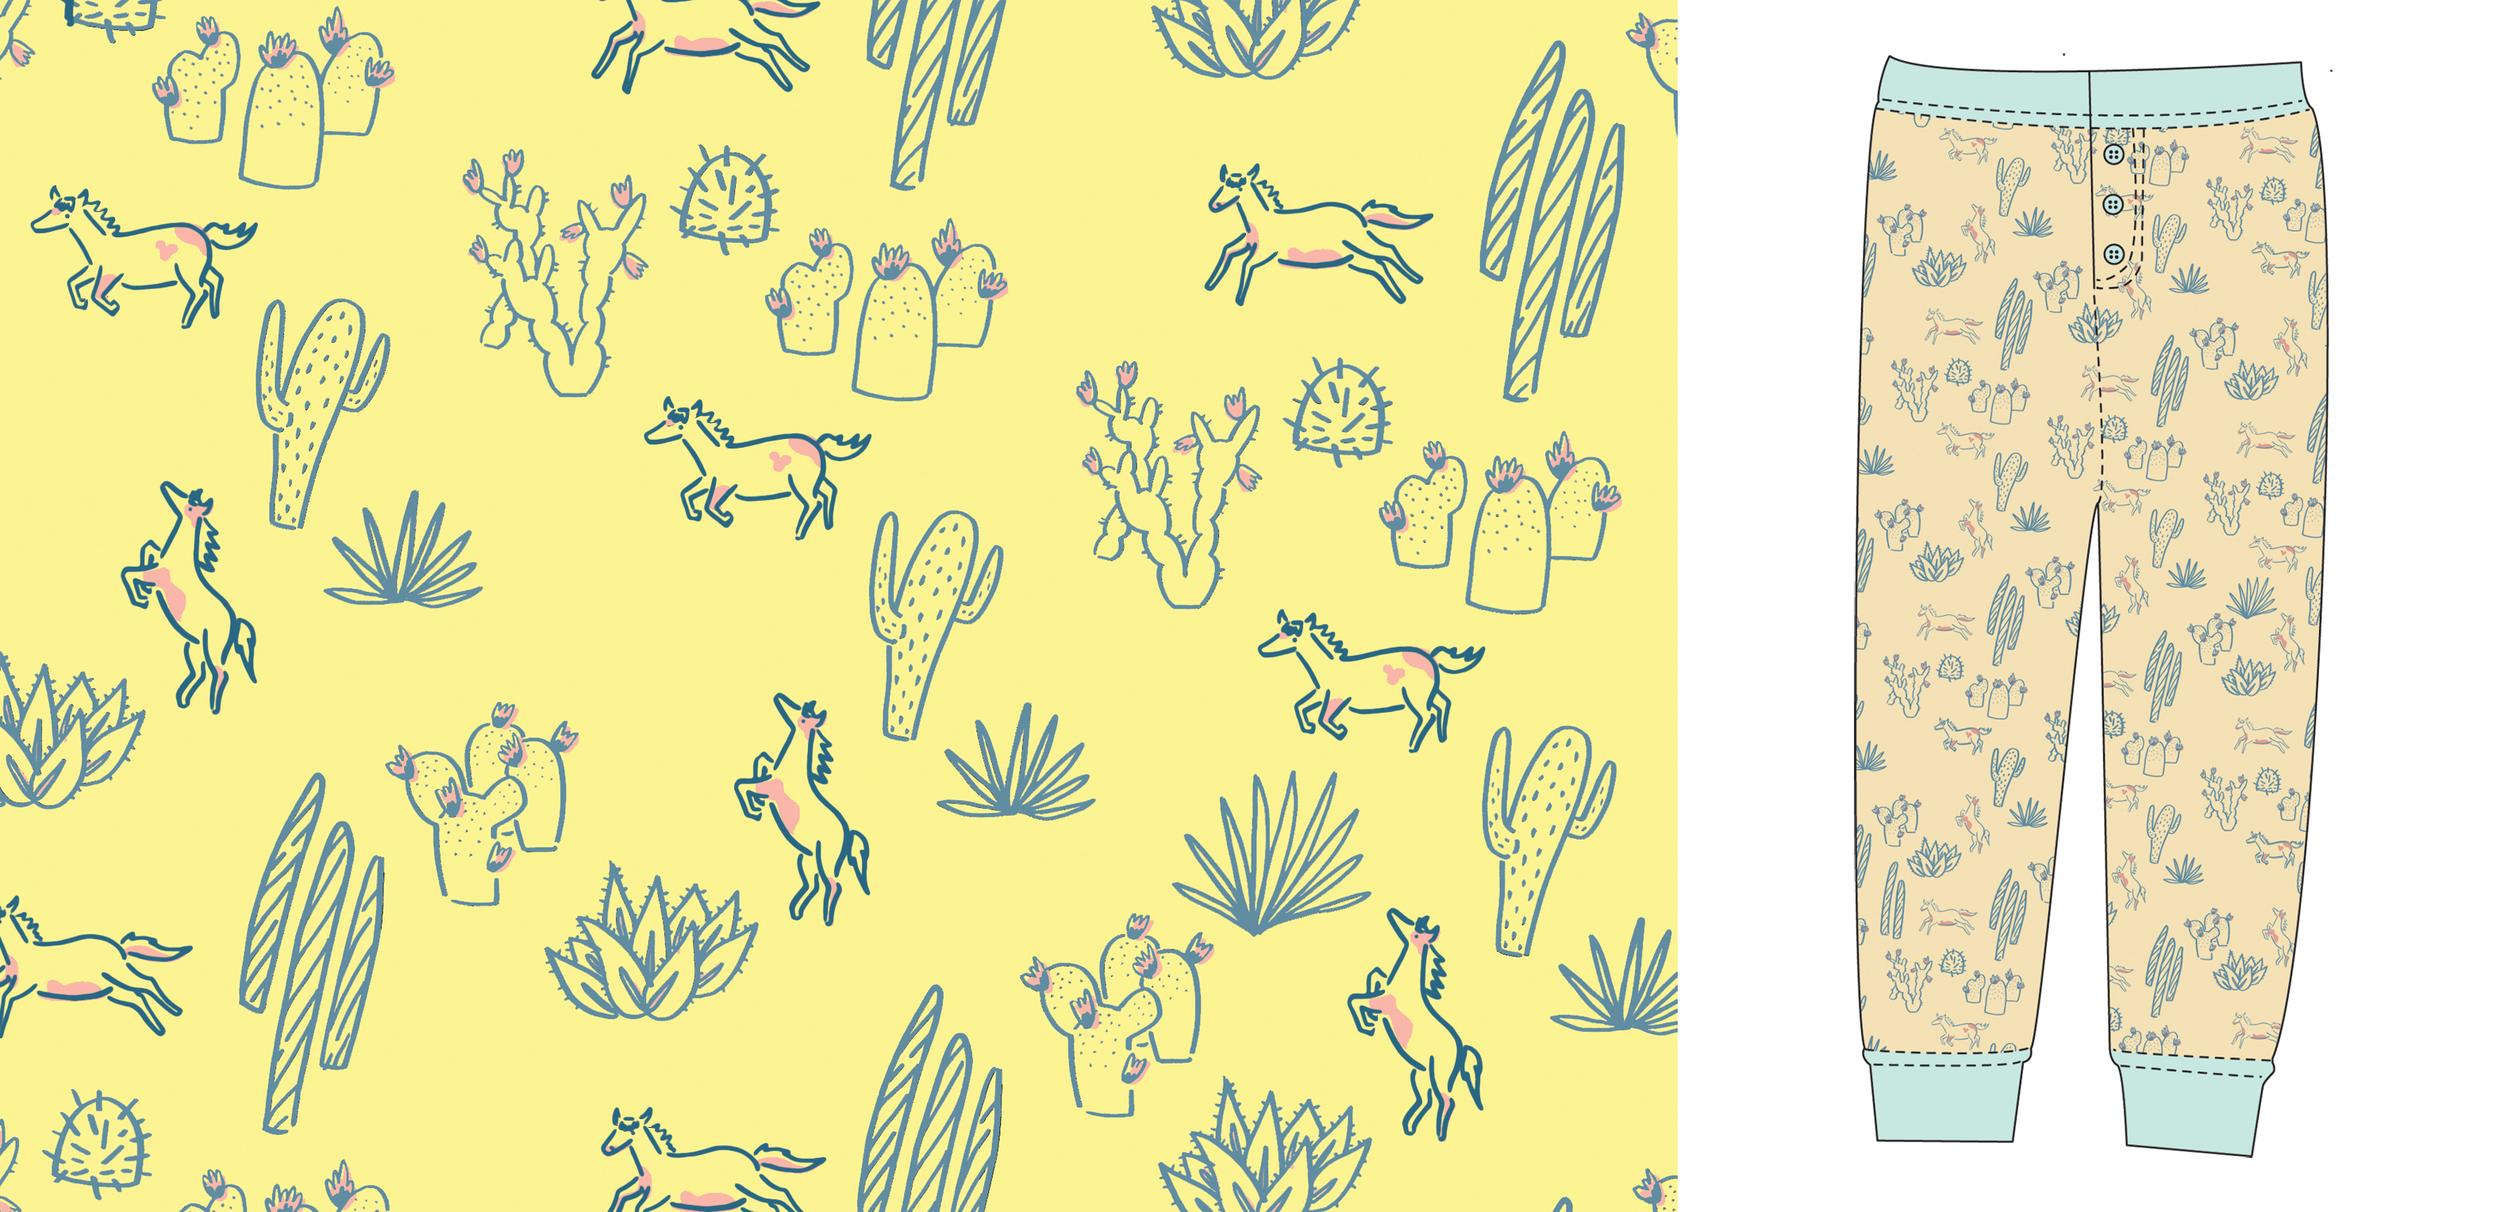 cacti and pony